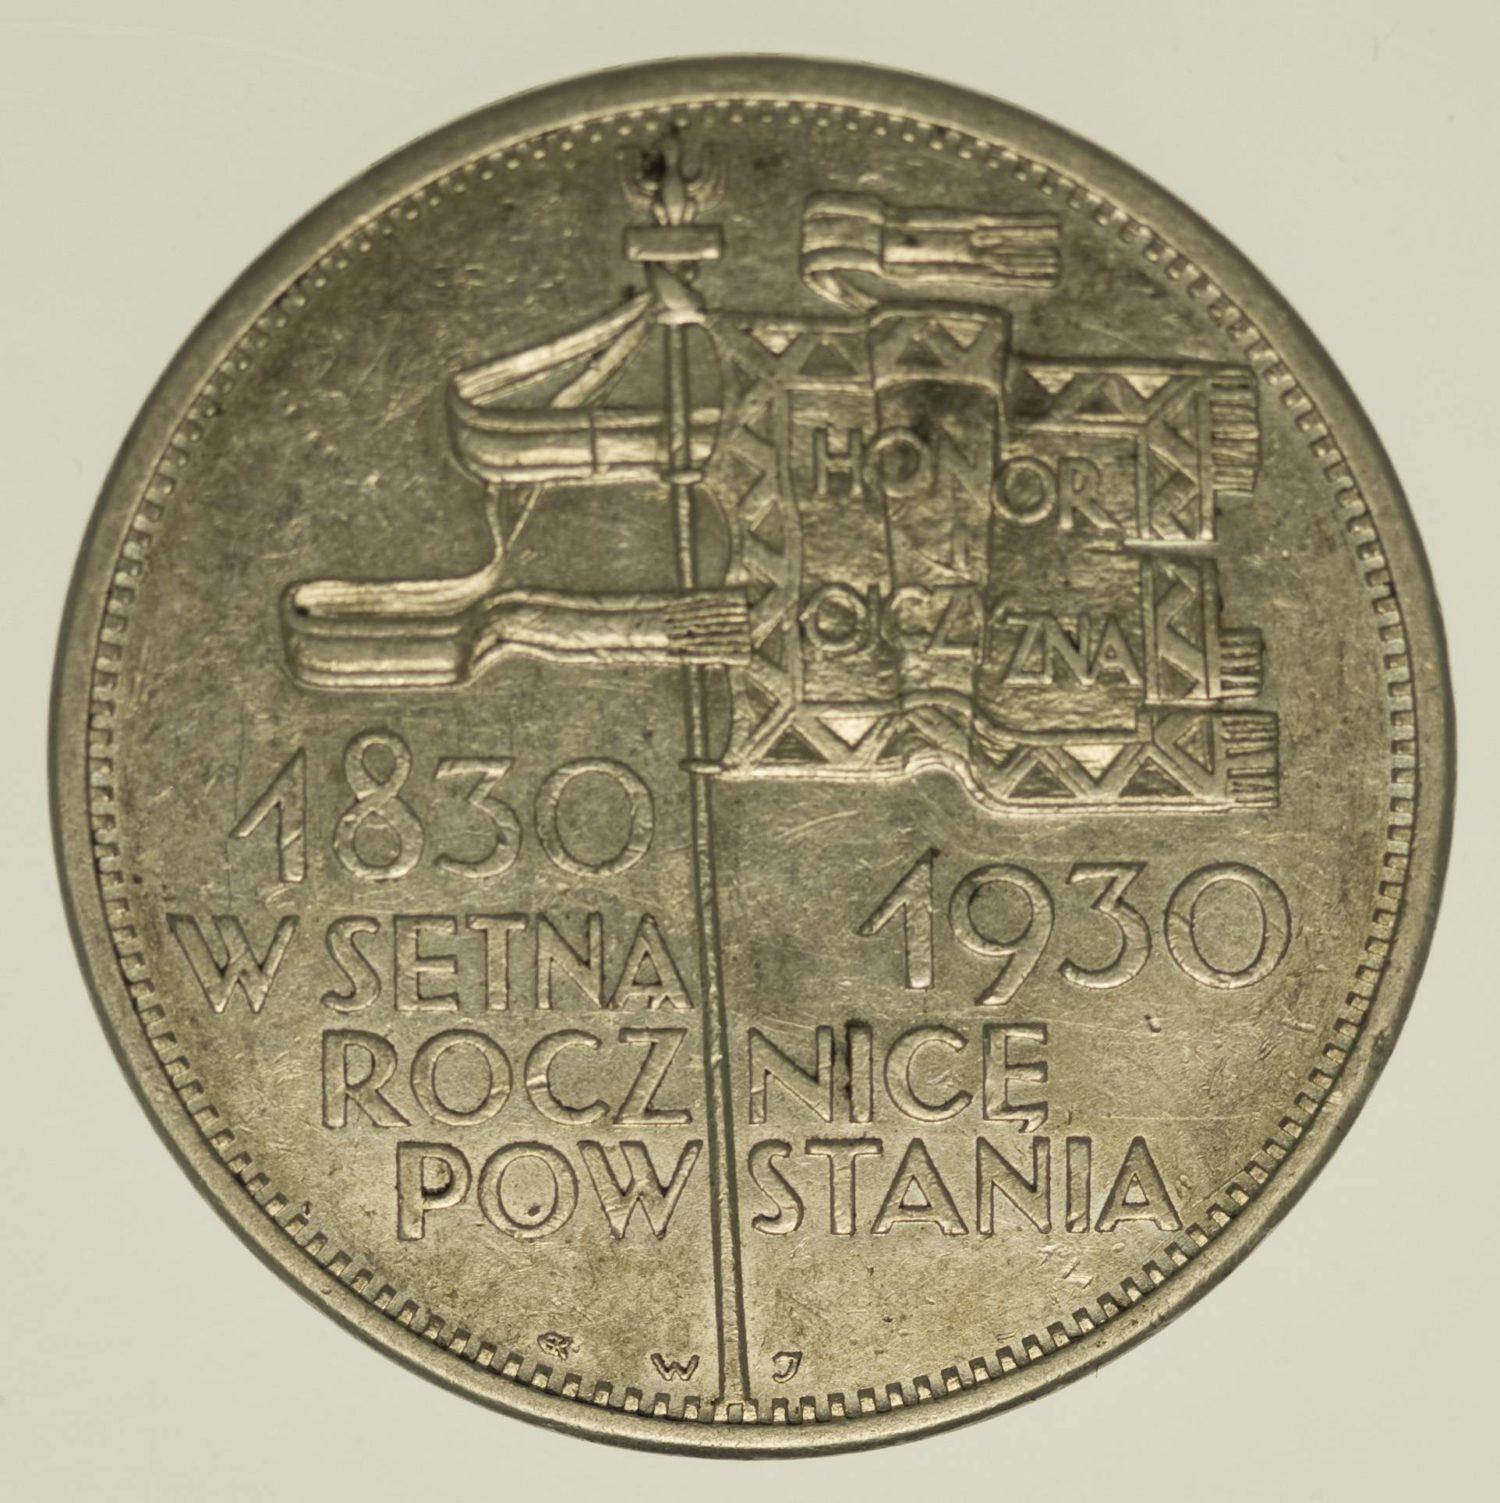 Polen 5 Zloty 1930 Silber 13,5 Gramm fein RAR